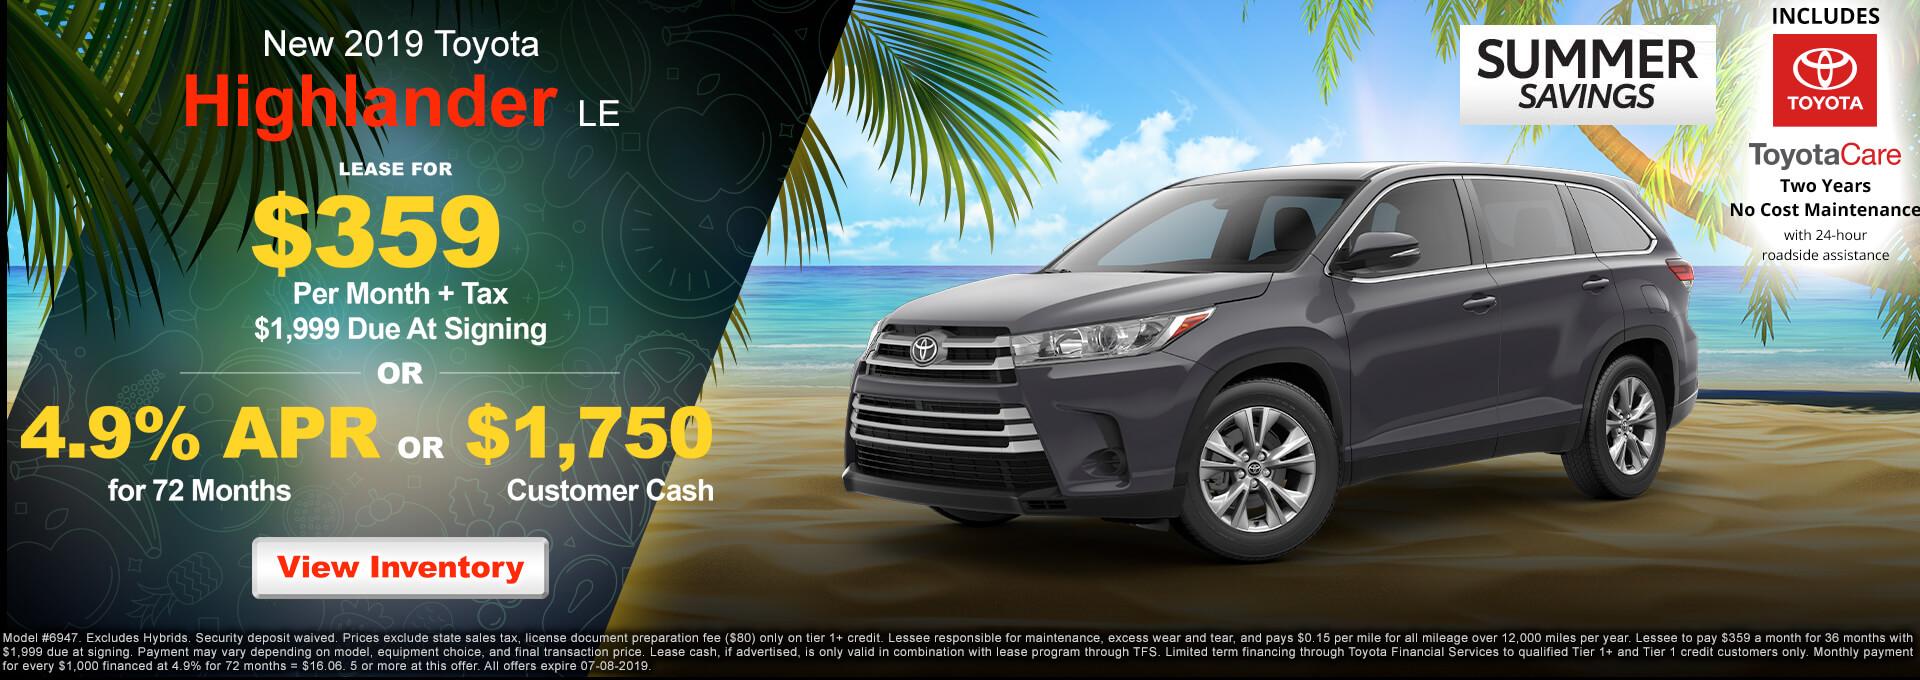 2019 Toyota Highlander $359